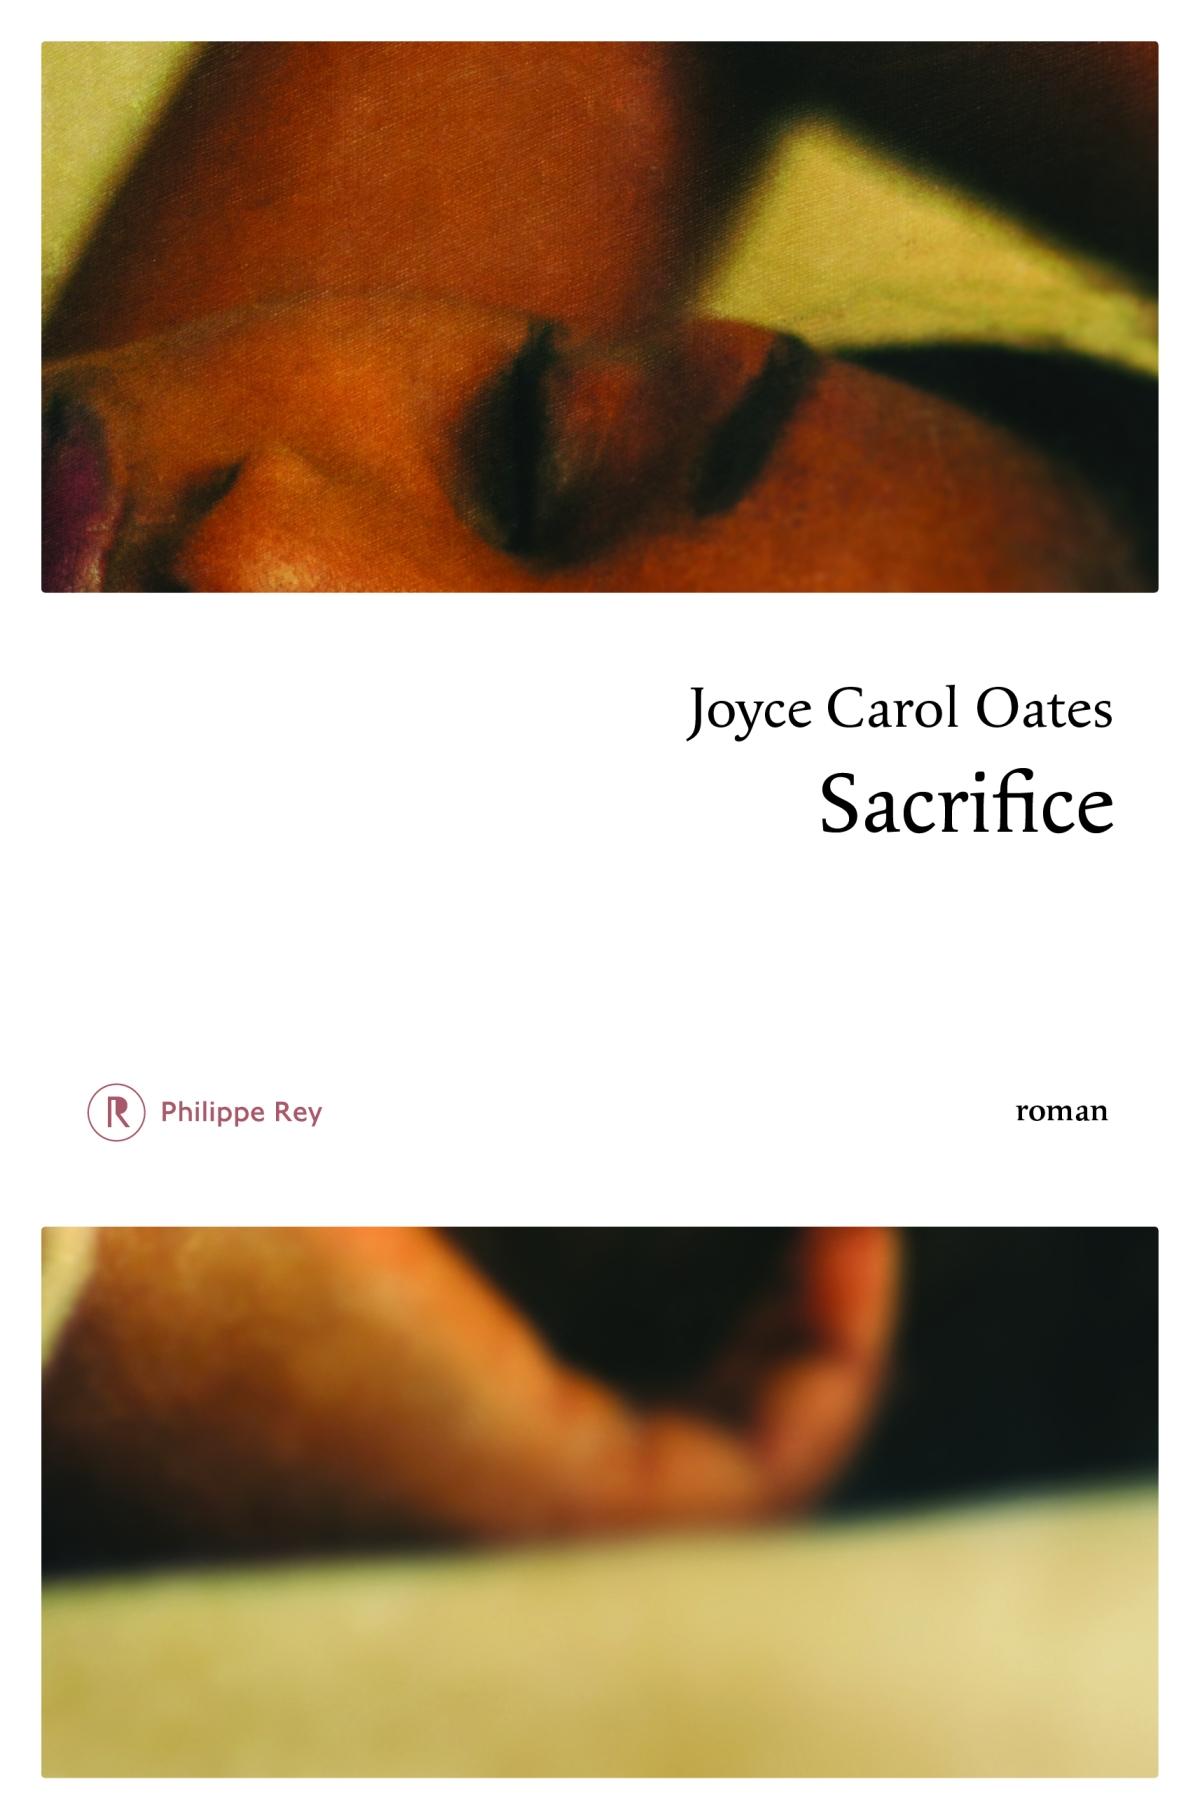 Sacrifice, Joyce Carol Oates, éditions Philippe Rey, 2016, 357pages.